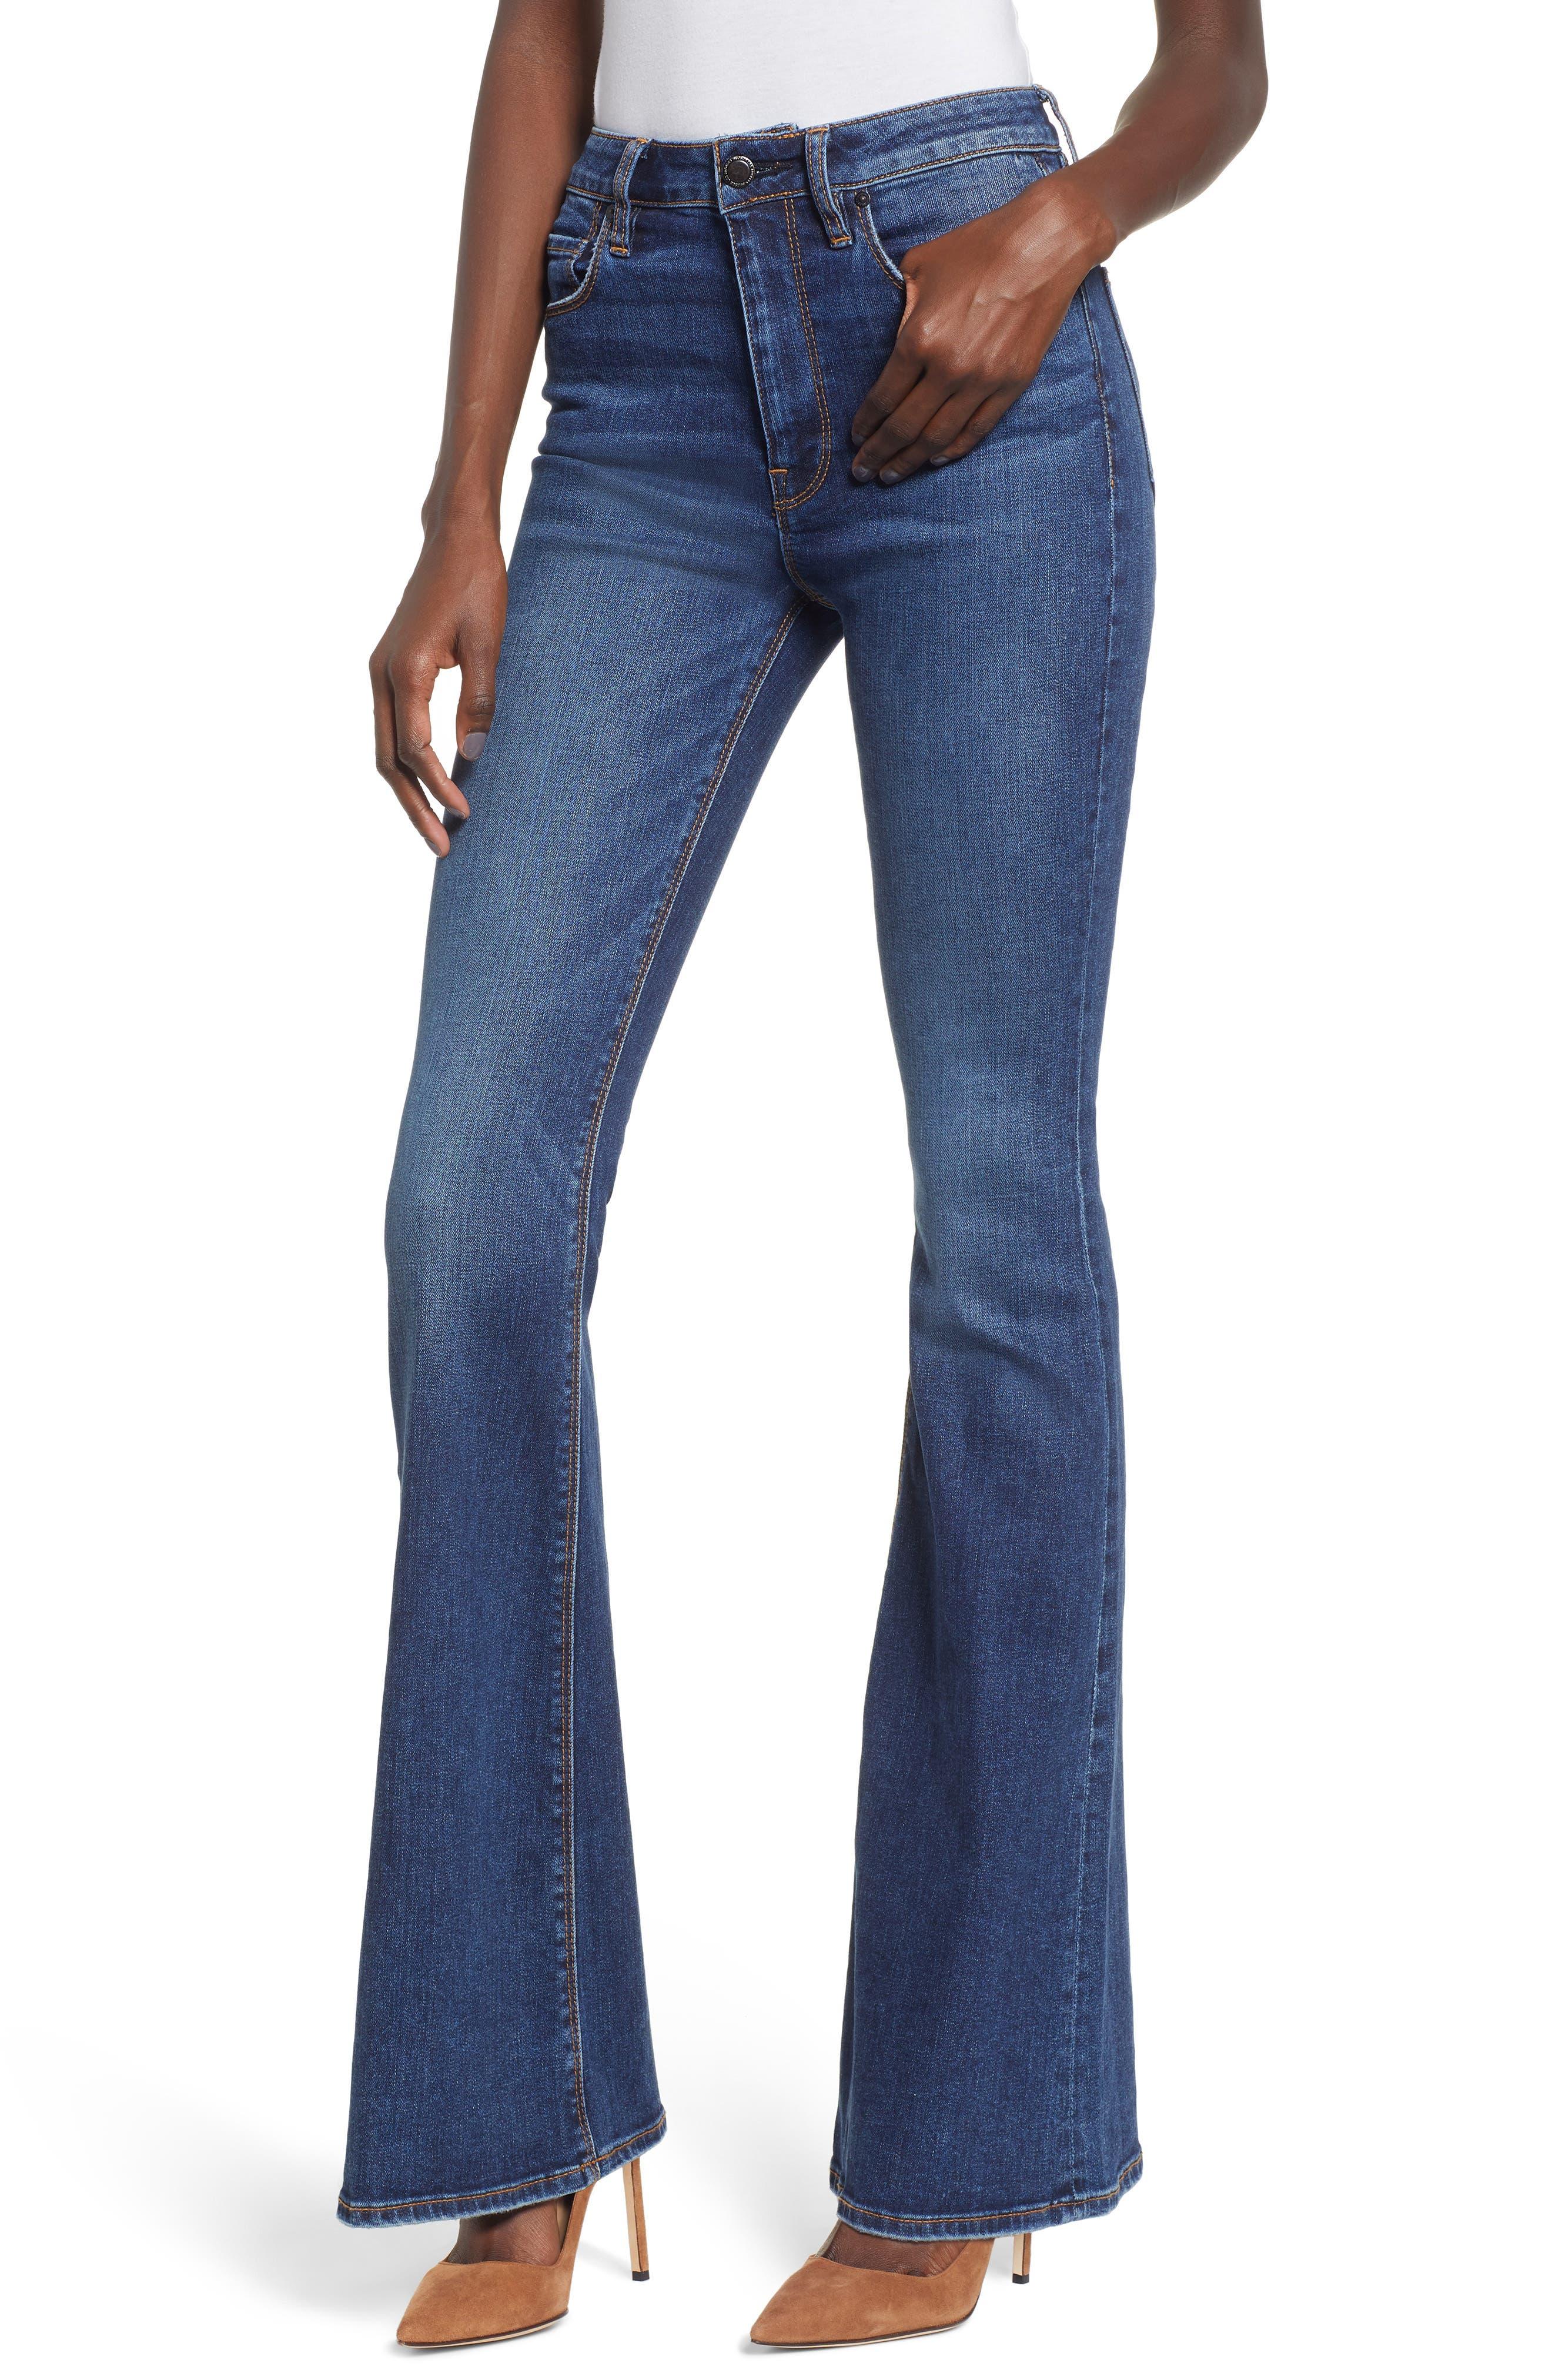 HUDSON JEANS, Holly High Waist Flare Jeans, Main thumbnail 1, color, VAGABOND